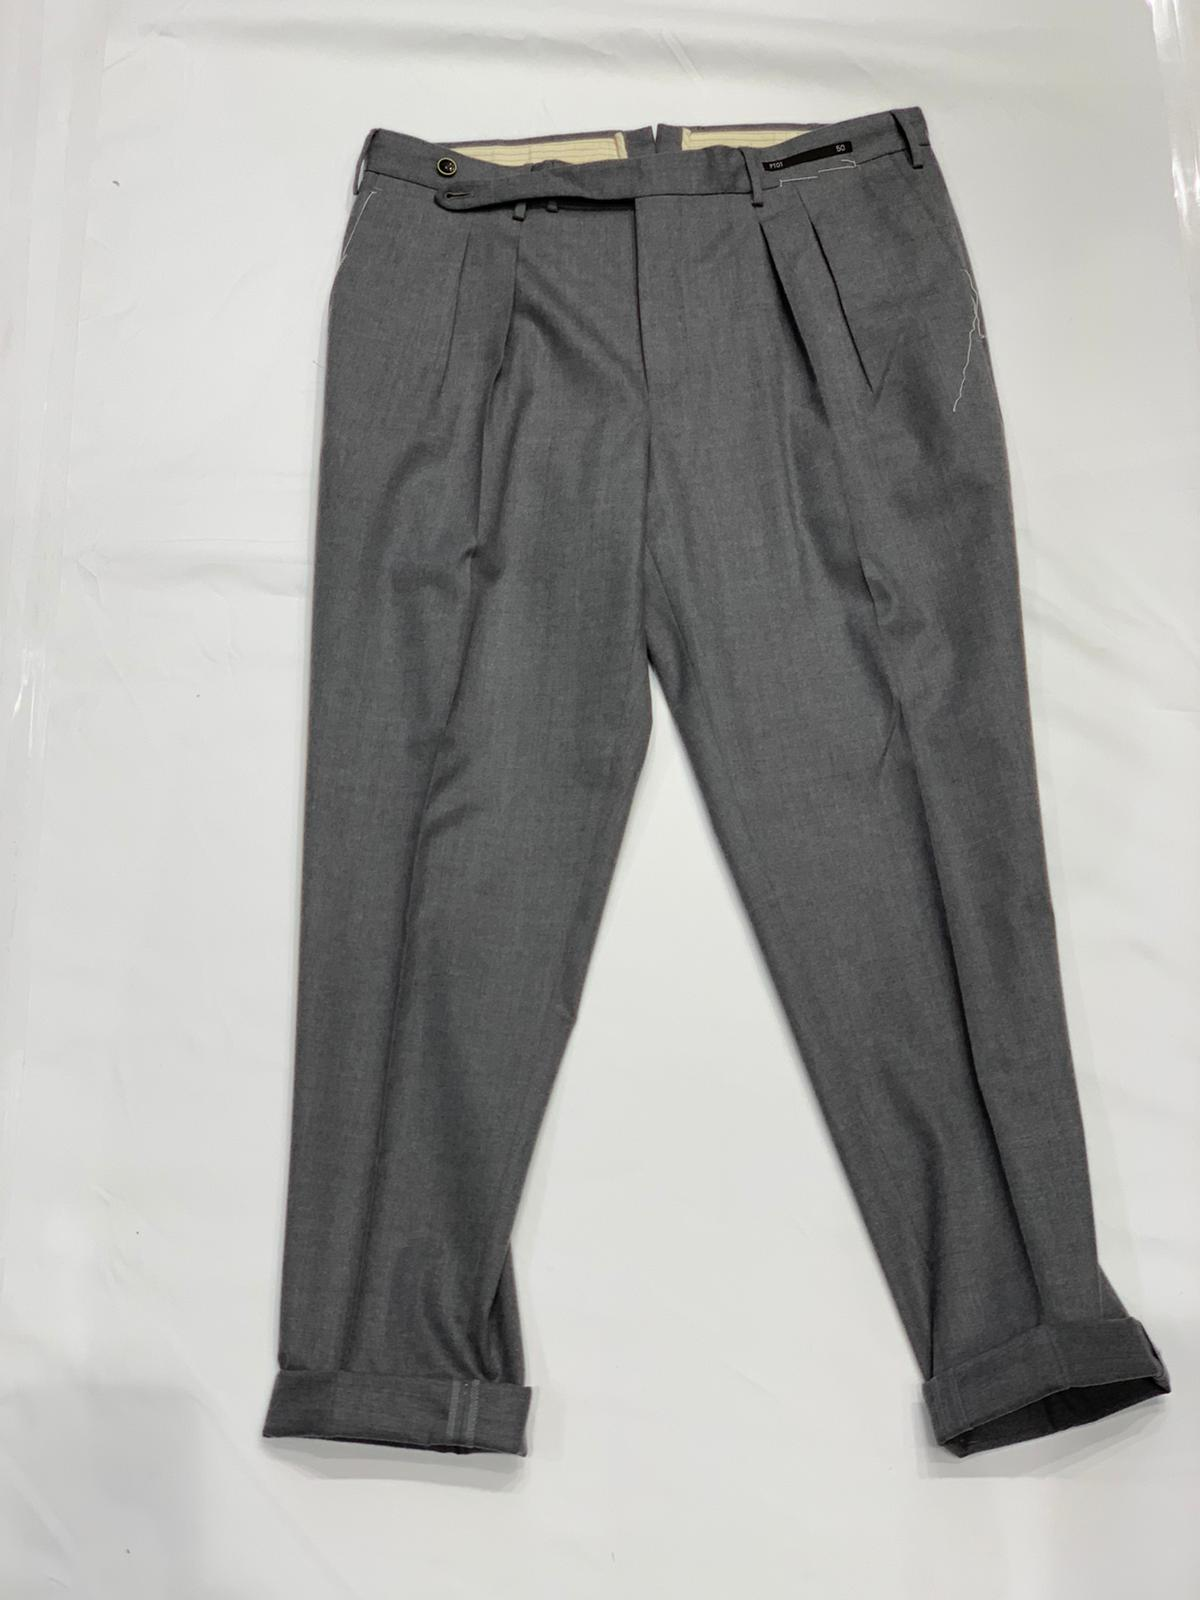 Pantalone PT01 PT01   9   ZFCLZ00HE1 CO15220